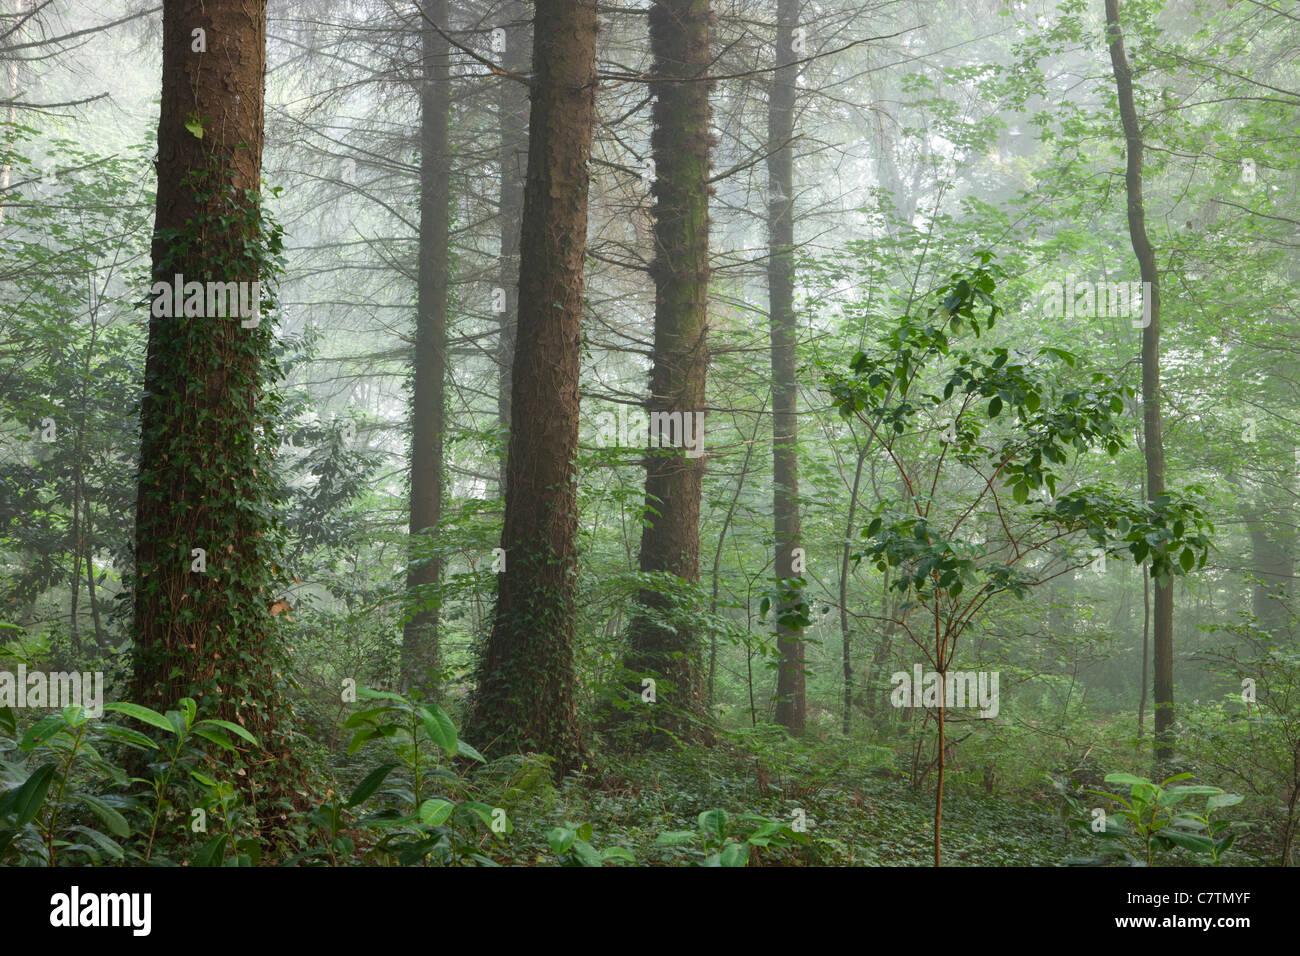 Misty mañana de verano dentro de un bosque, Madera de Morchard británico, Devon, Inglaterra. Verano (julio Imagen De Stock